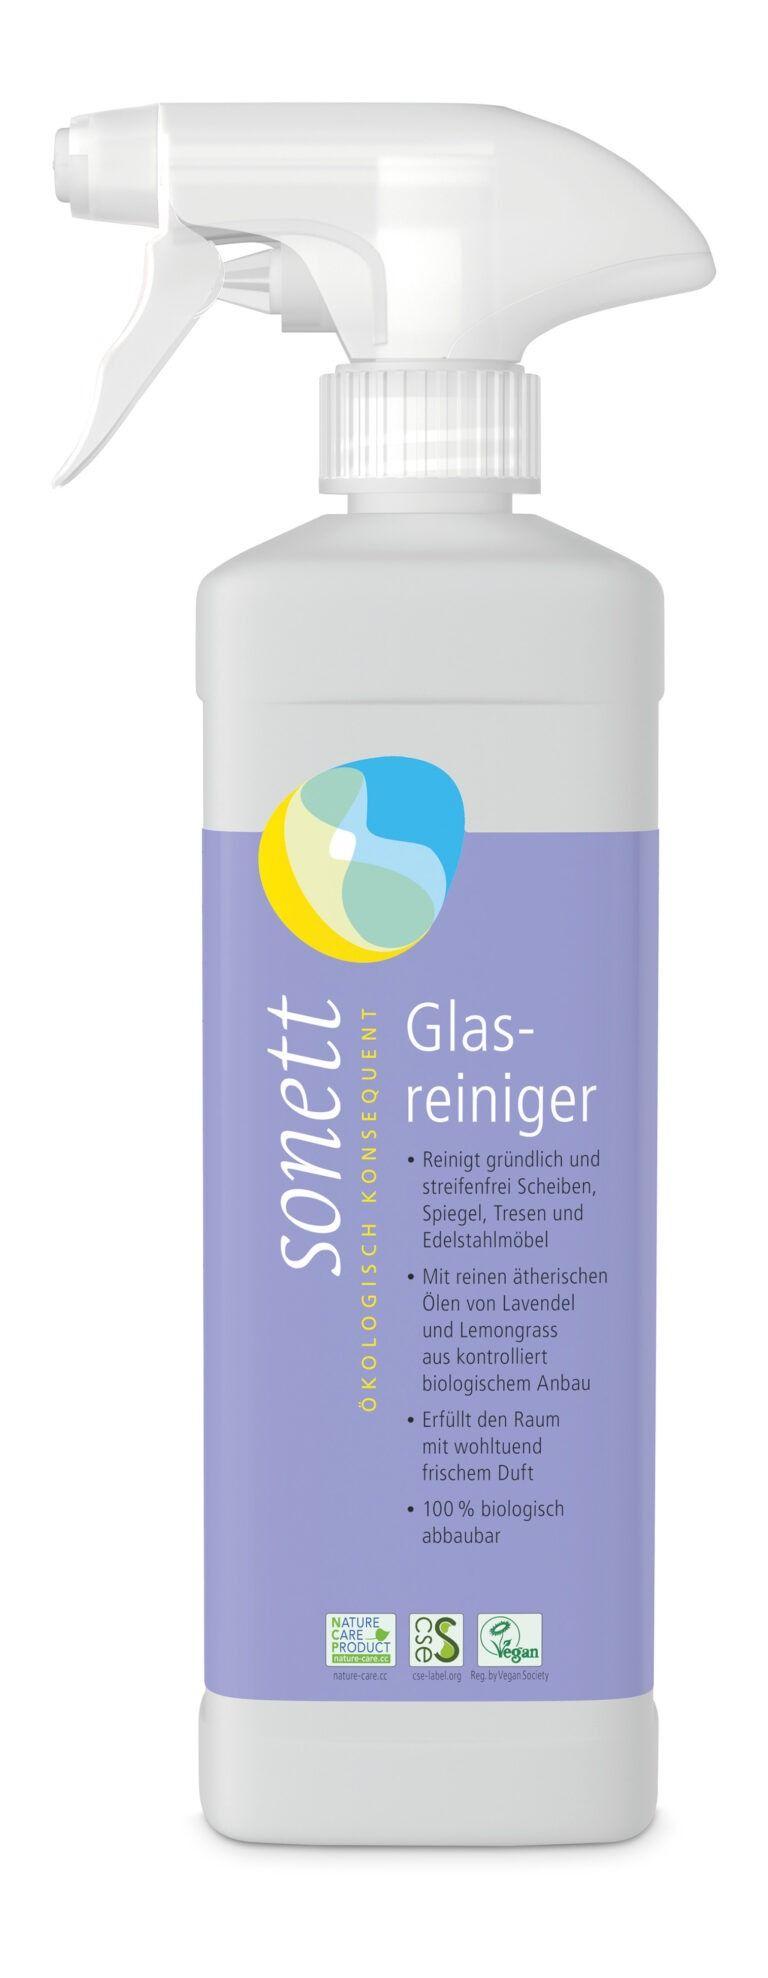 SONETT Glasreiniger 0,5l